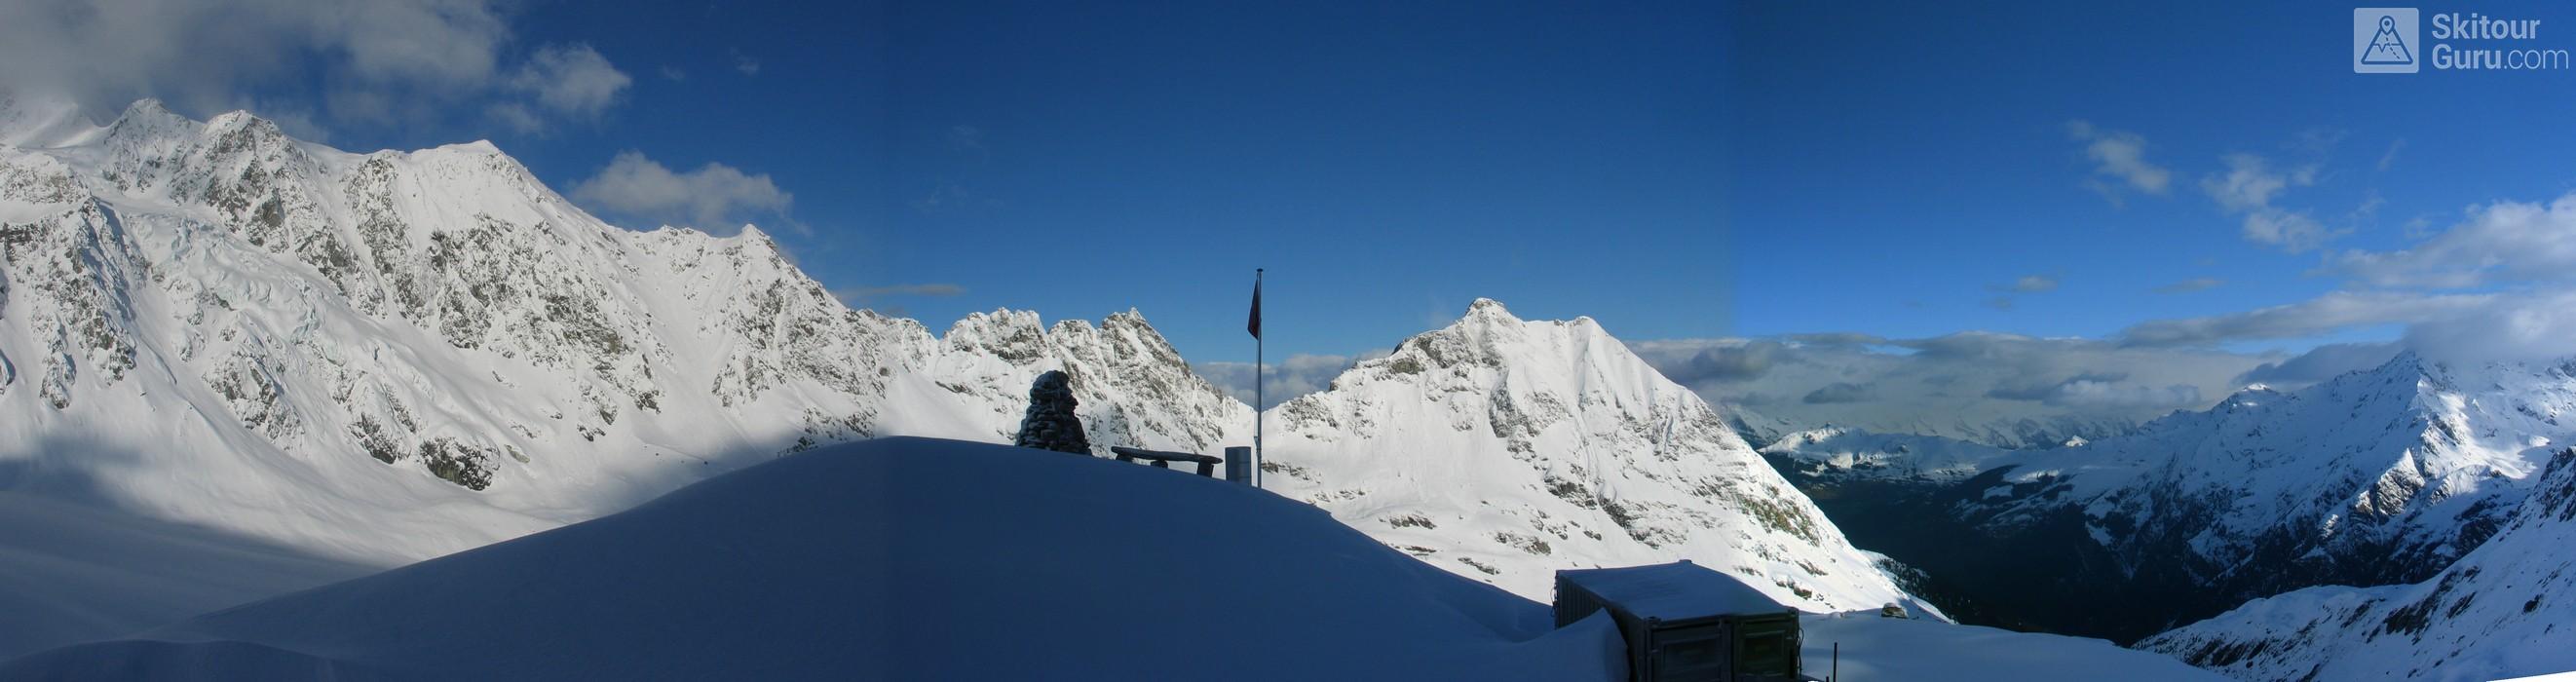 Cabane FXB Panossière   Walliser Alpen / Alpes valaisannes Switzerland panorama 18